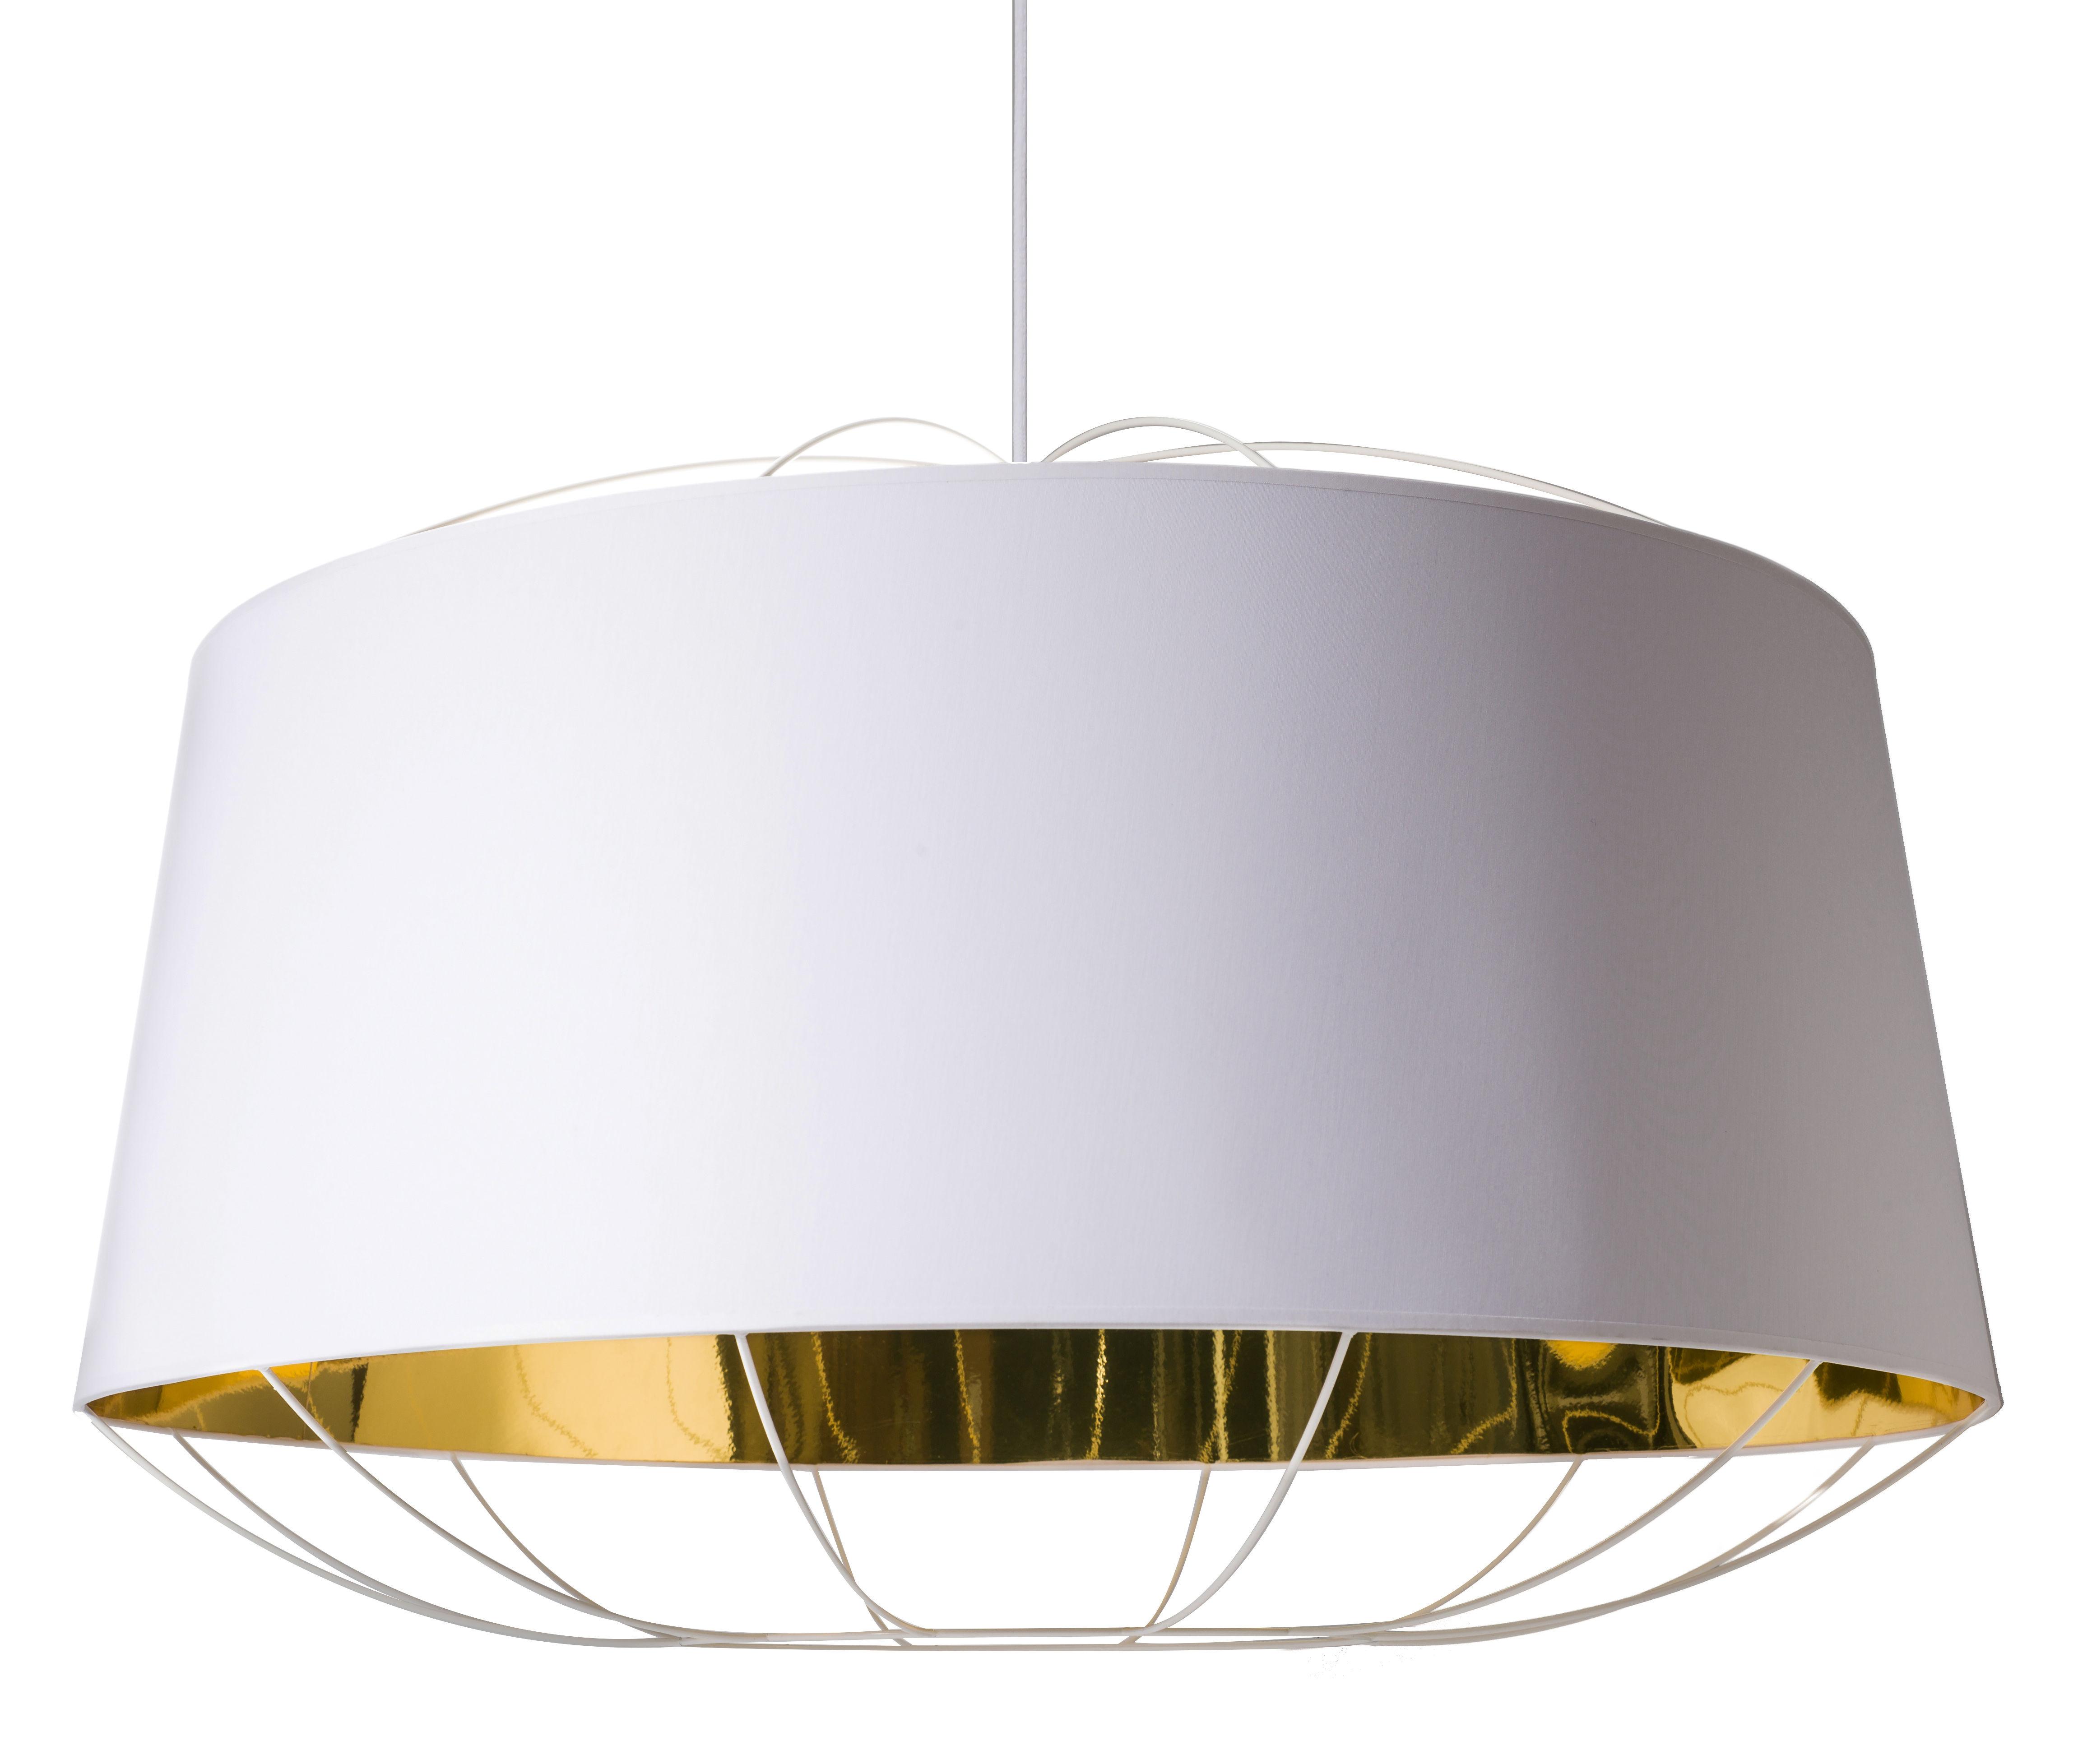 Lighting - Pendant Lighting - Lanterna Large Pendant by Petite Friture - White / Gold - Cotton, Lacquered steel, PVC